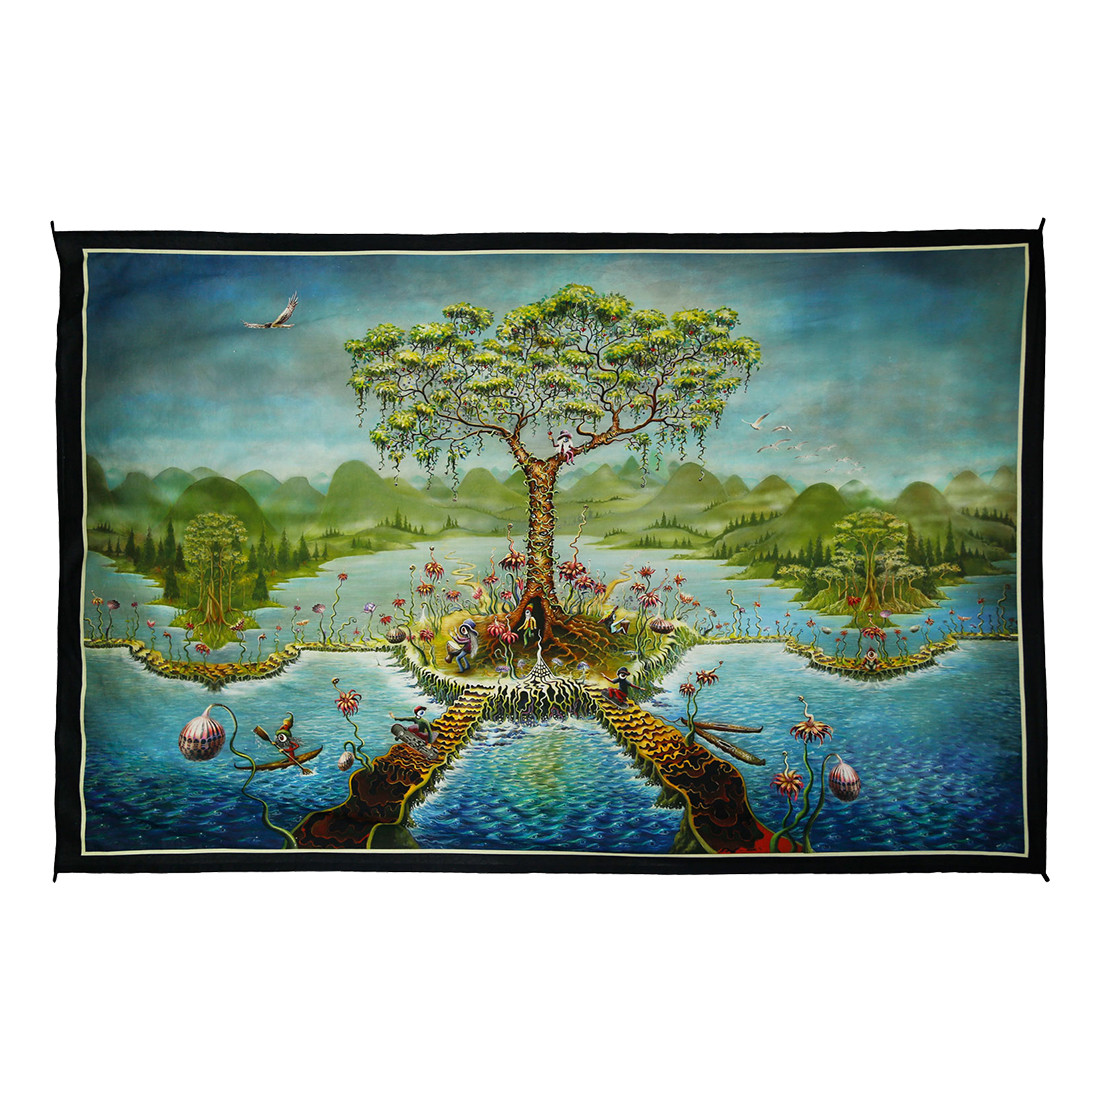 Eyeland Digital Art Print Tapestry